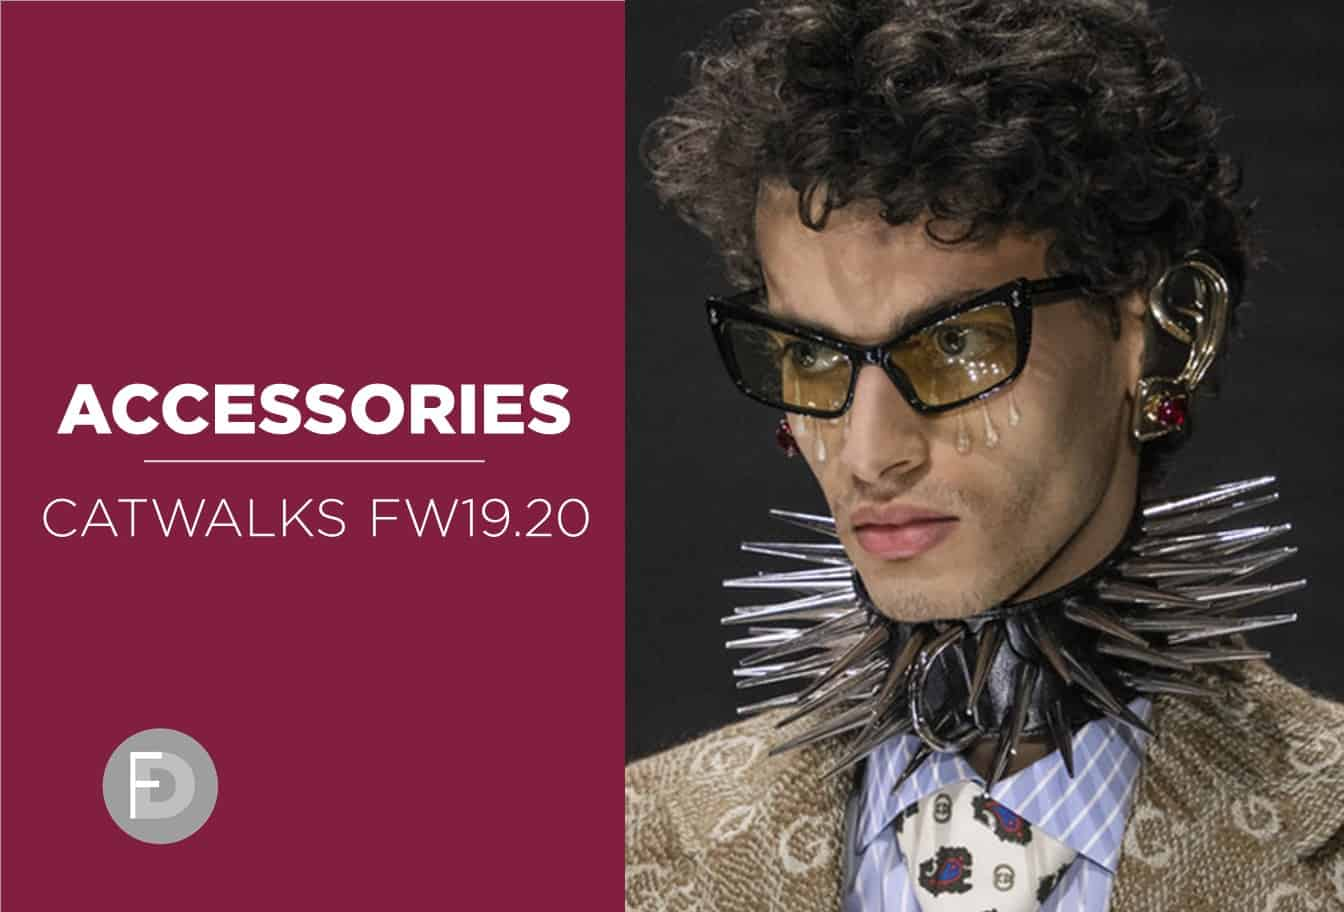 Accessories FW19.20